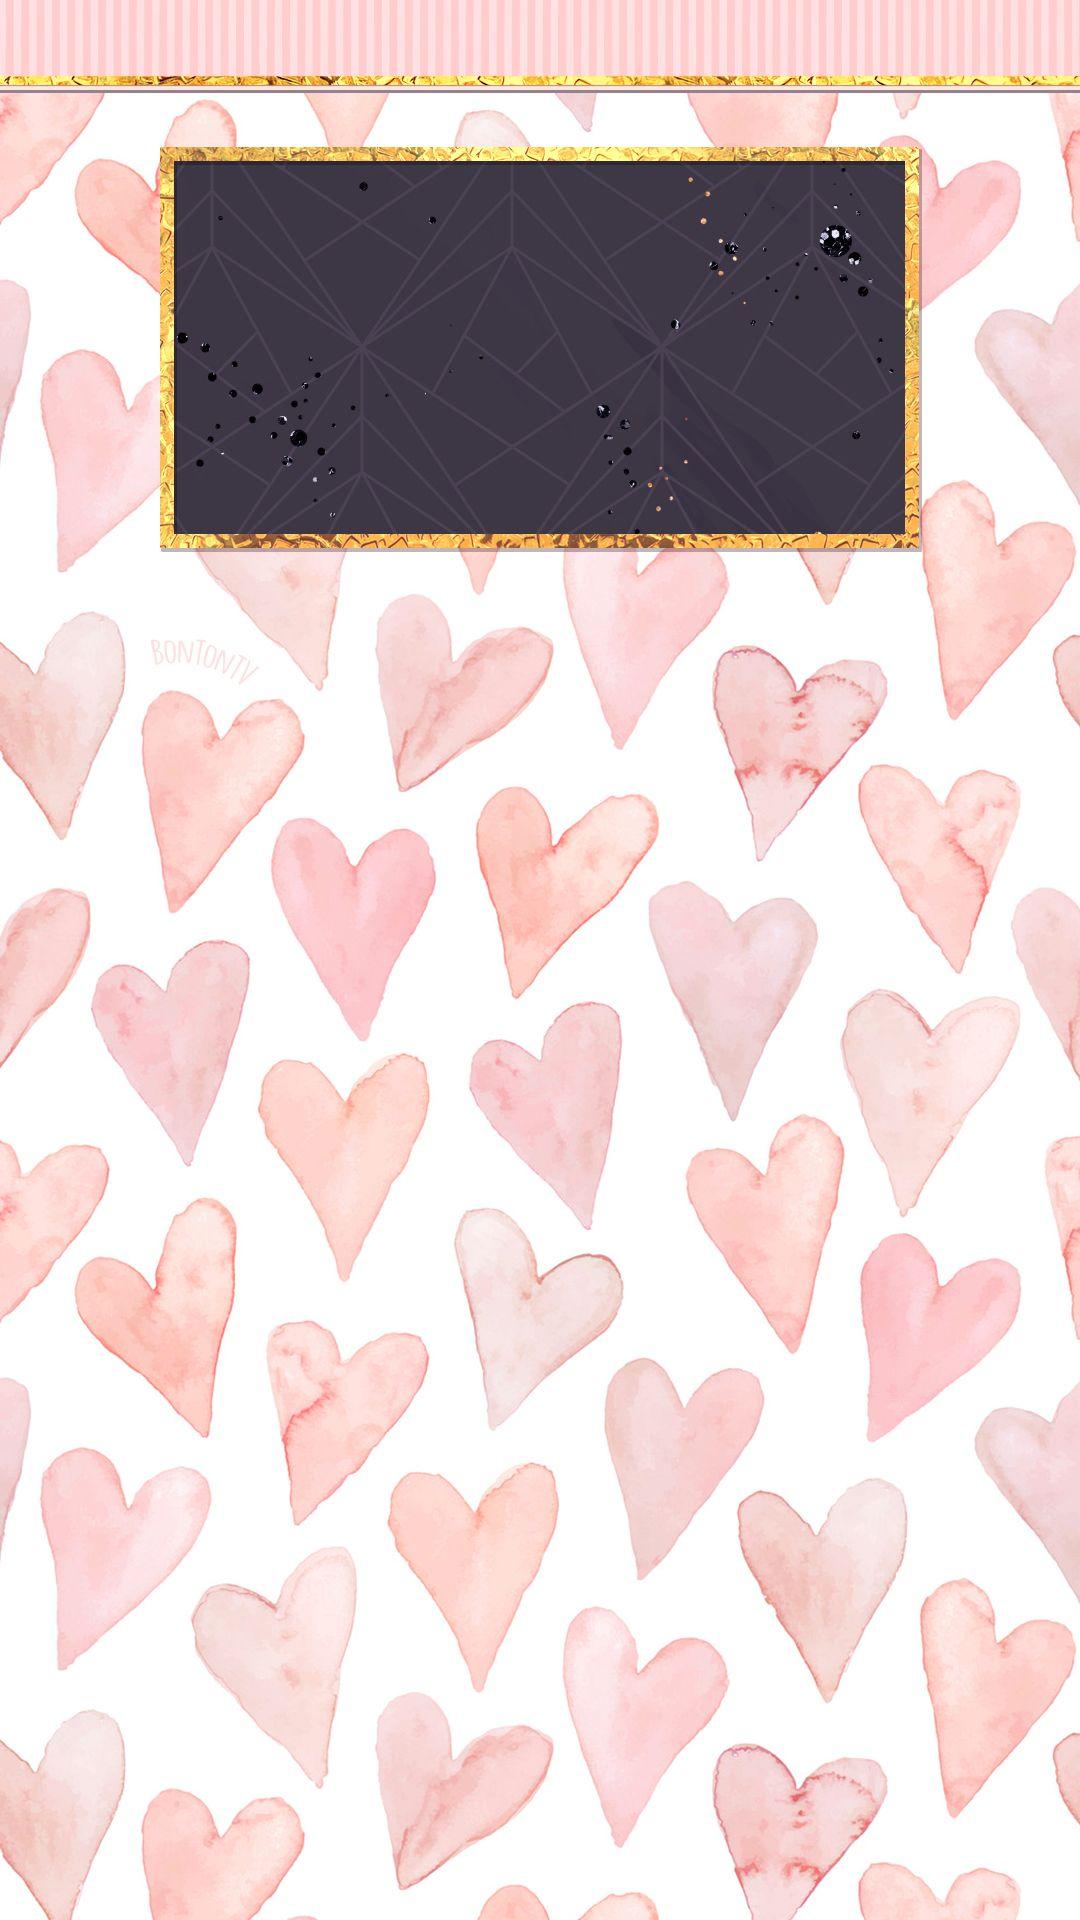 Phone Wallpapers Hd By Bonton Tv Free Download